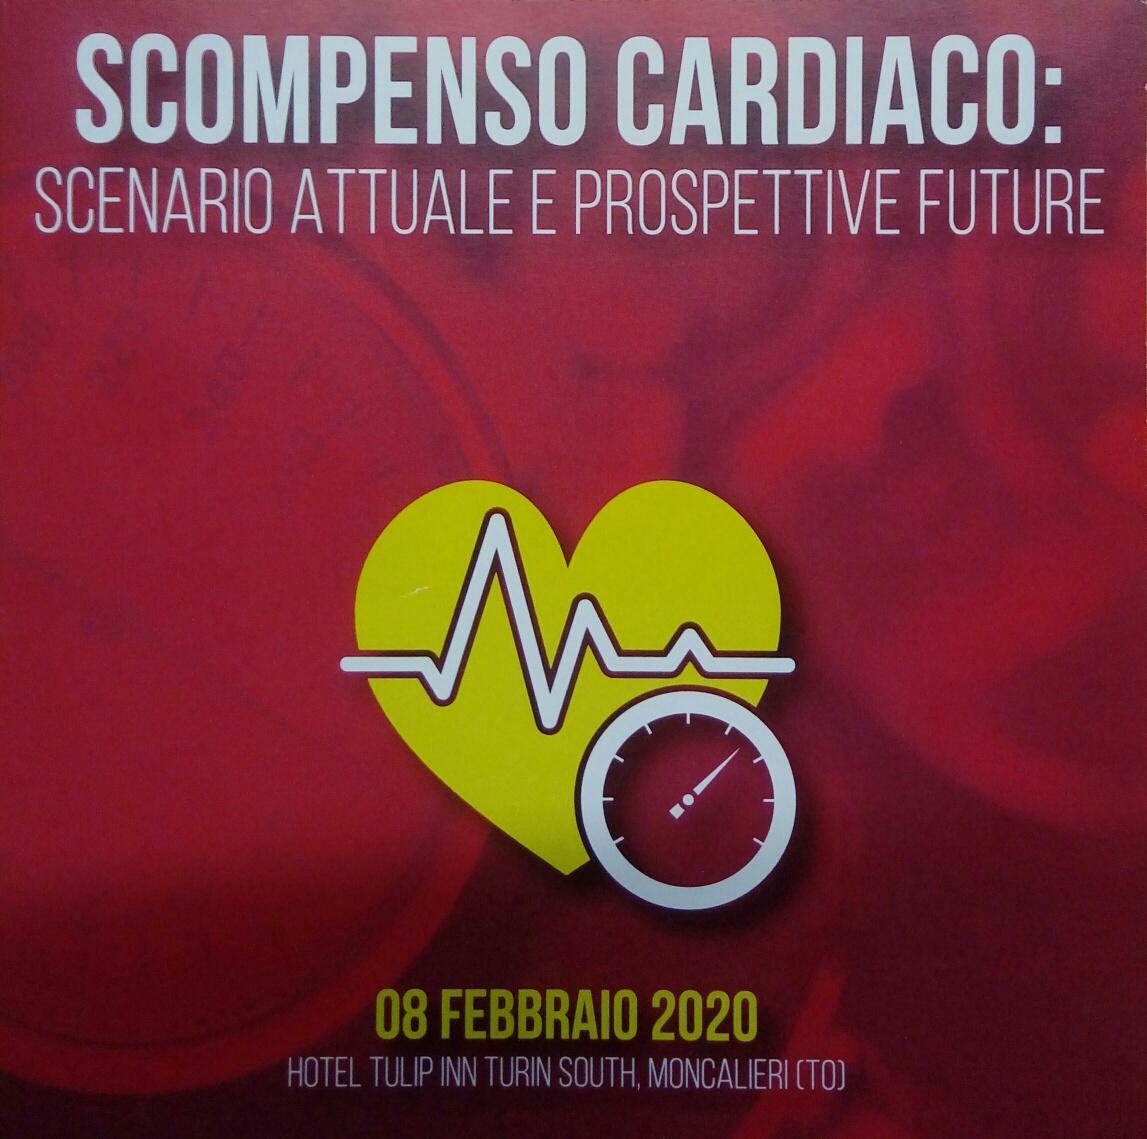 Scompenso cardiaco a Moncalieri tra realtà e futuro